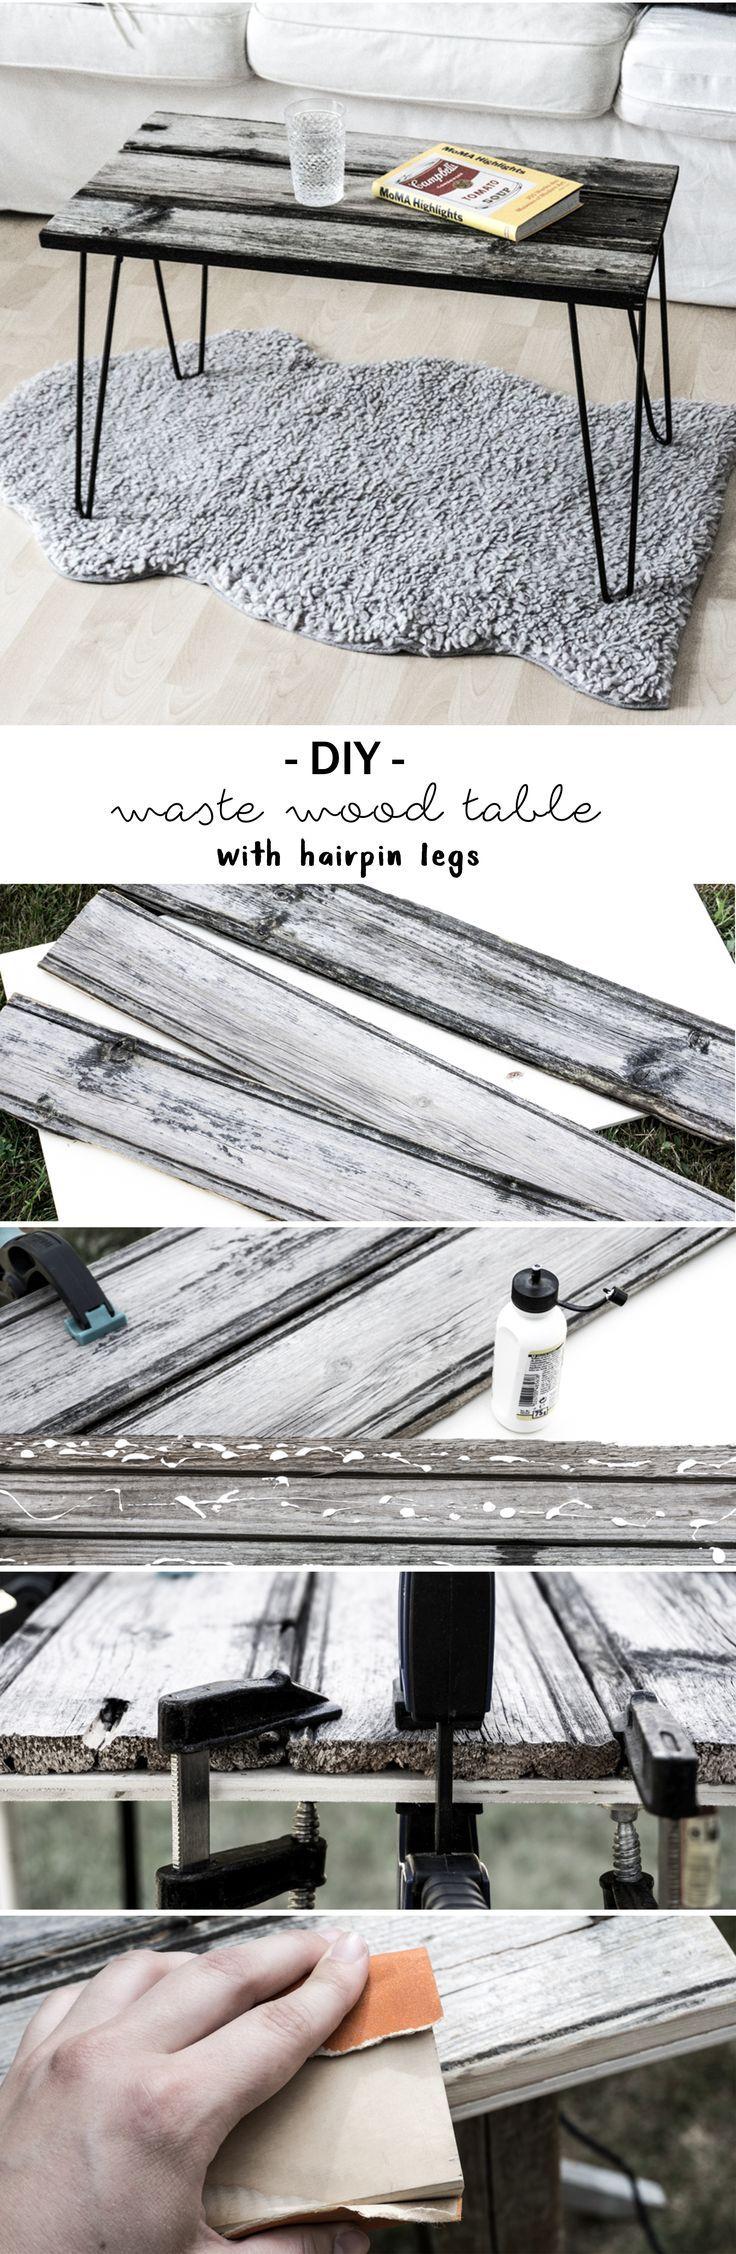 let 39 s upcycle altholz couchtisch selber bauen diy deko selber machen tisch m bel und diy m bel. Black Bedroom Furniture Sets. Home Design Ideas